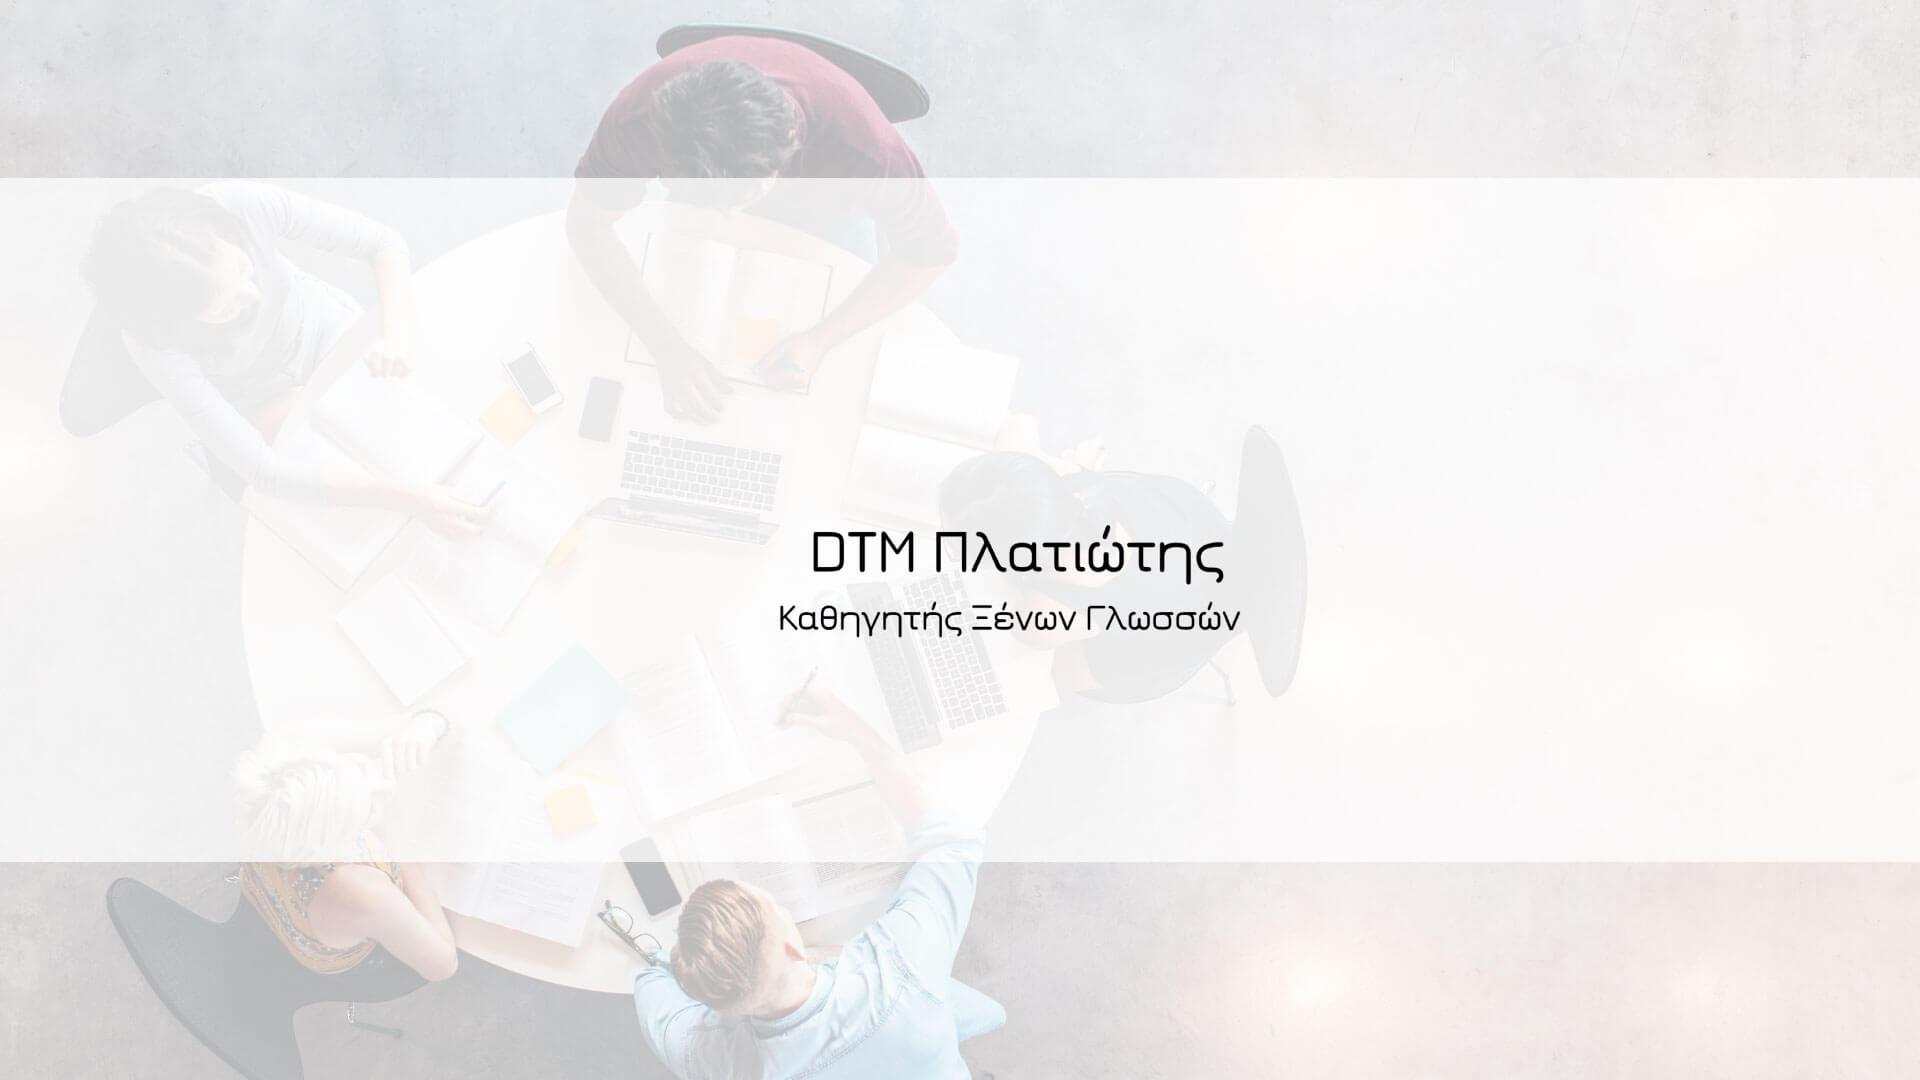 DTM Πλατιώτης